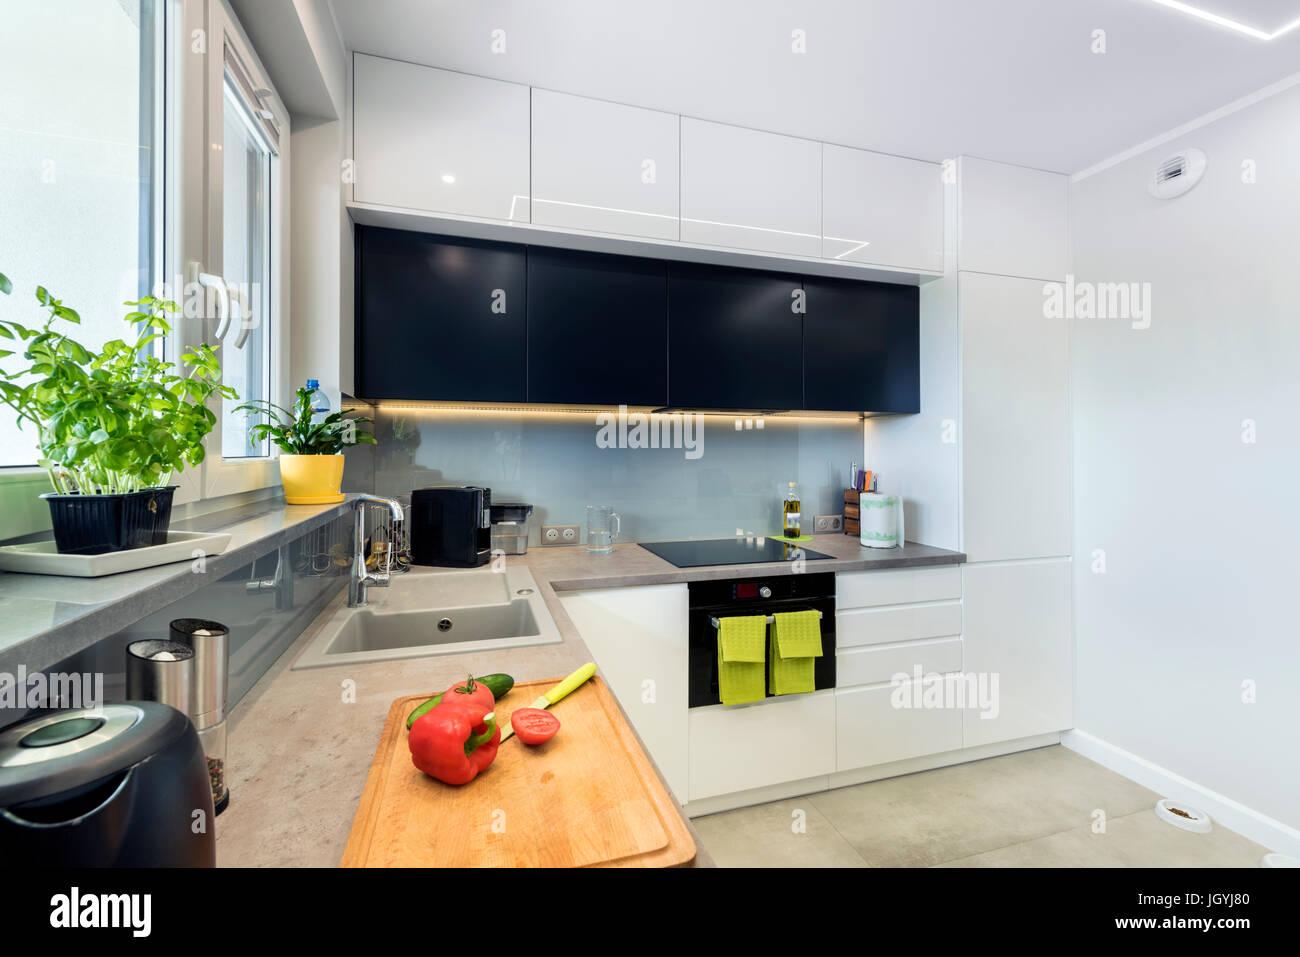 Modern kitchen interior design in white and black finishing Stock Photo